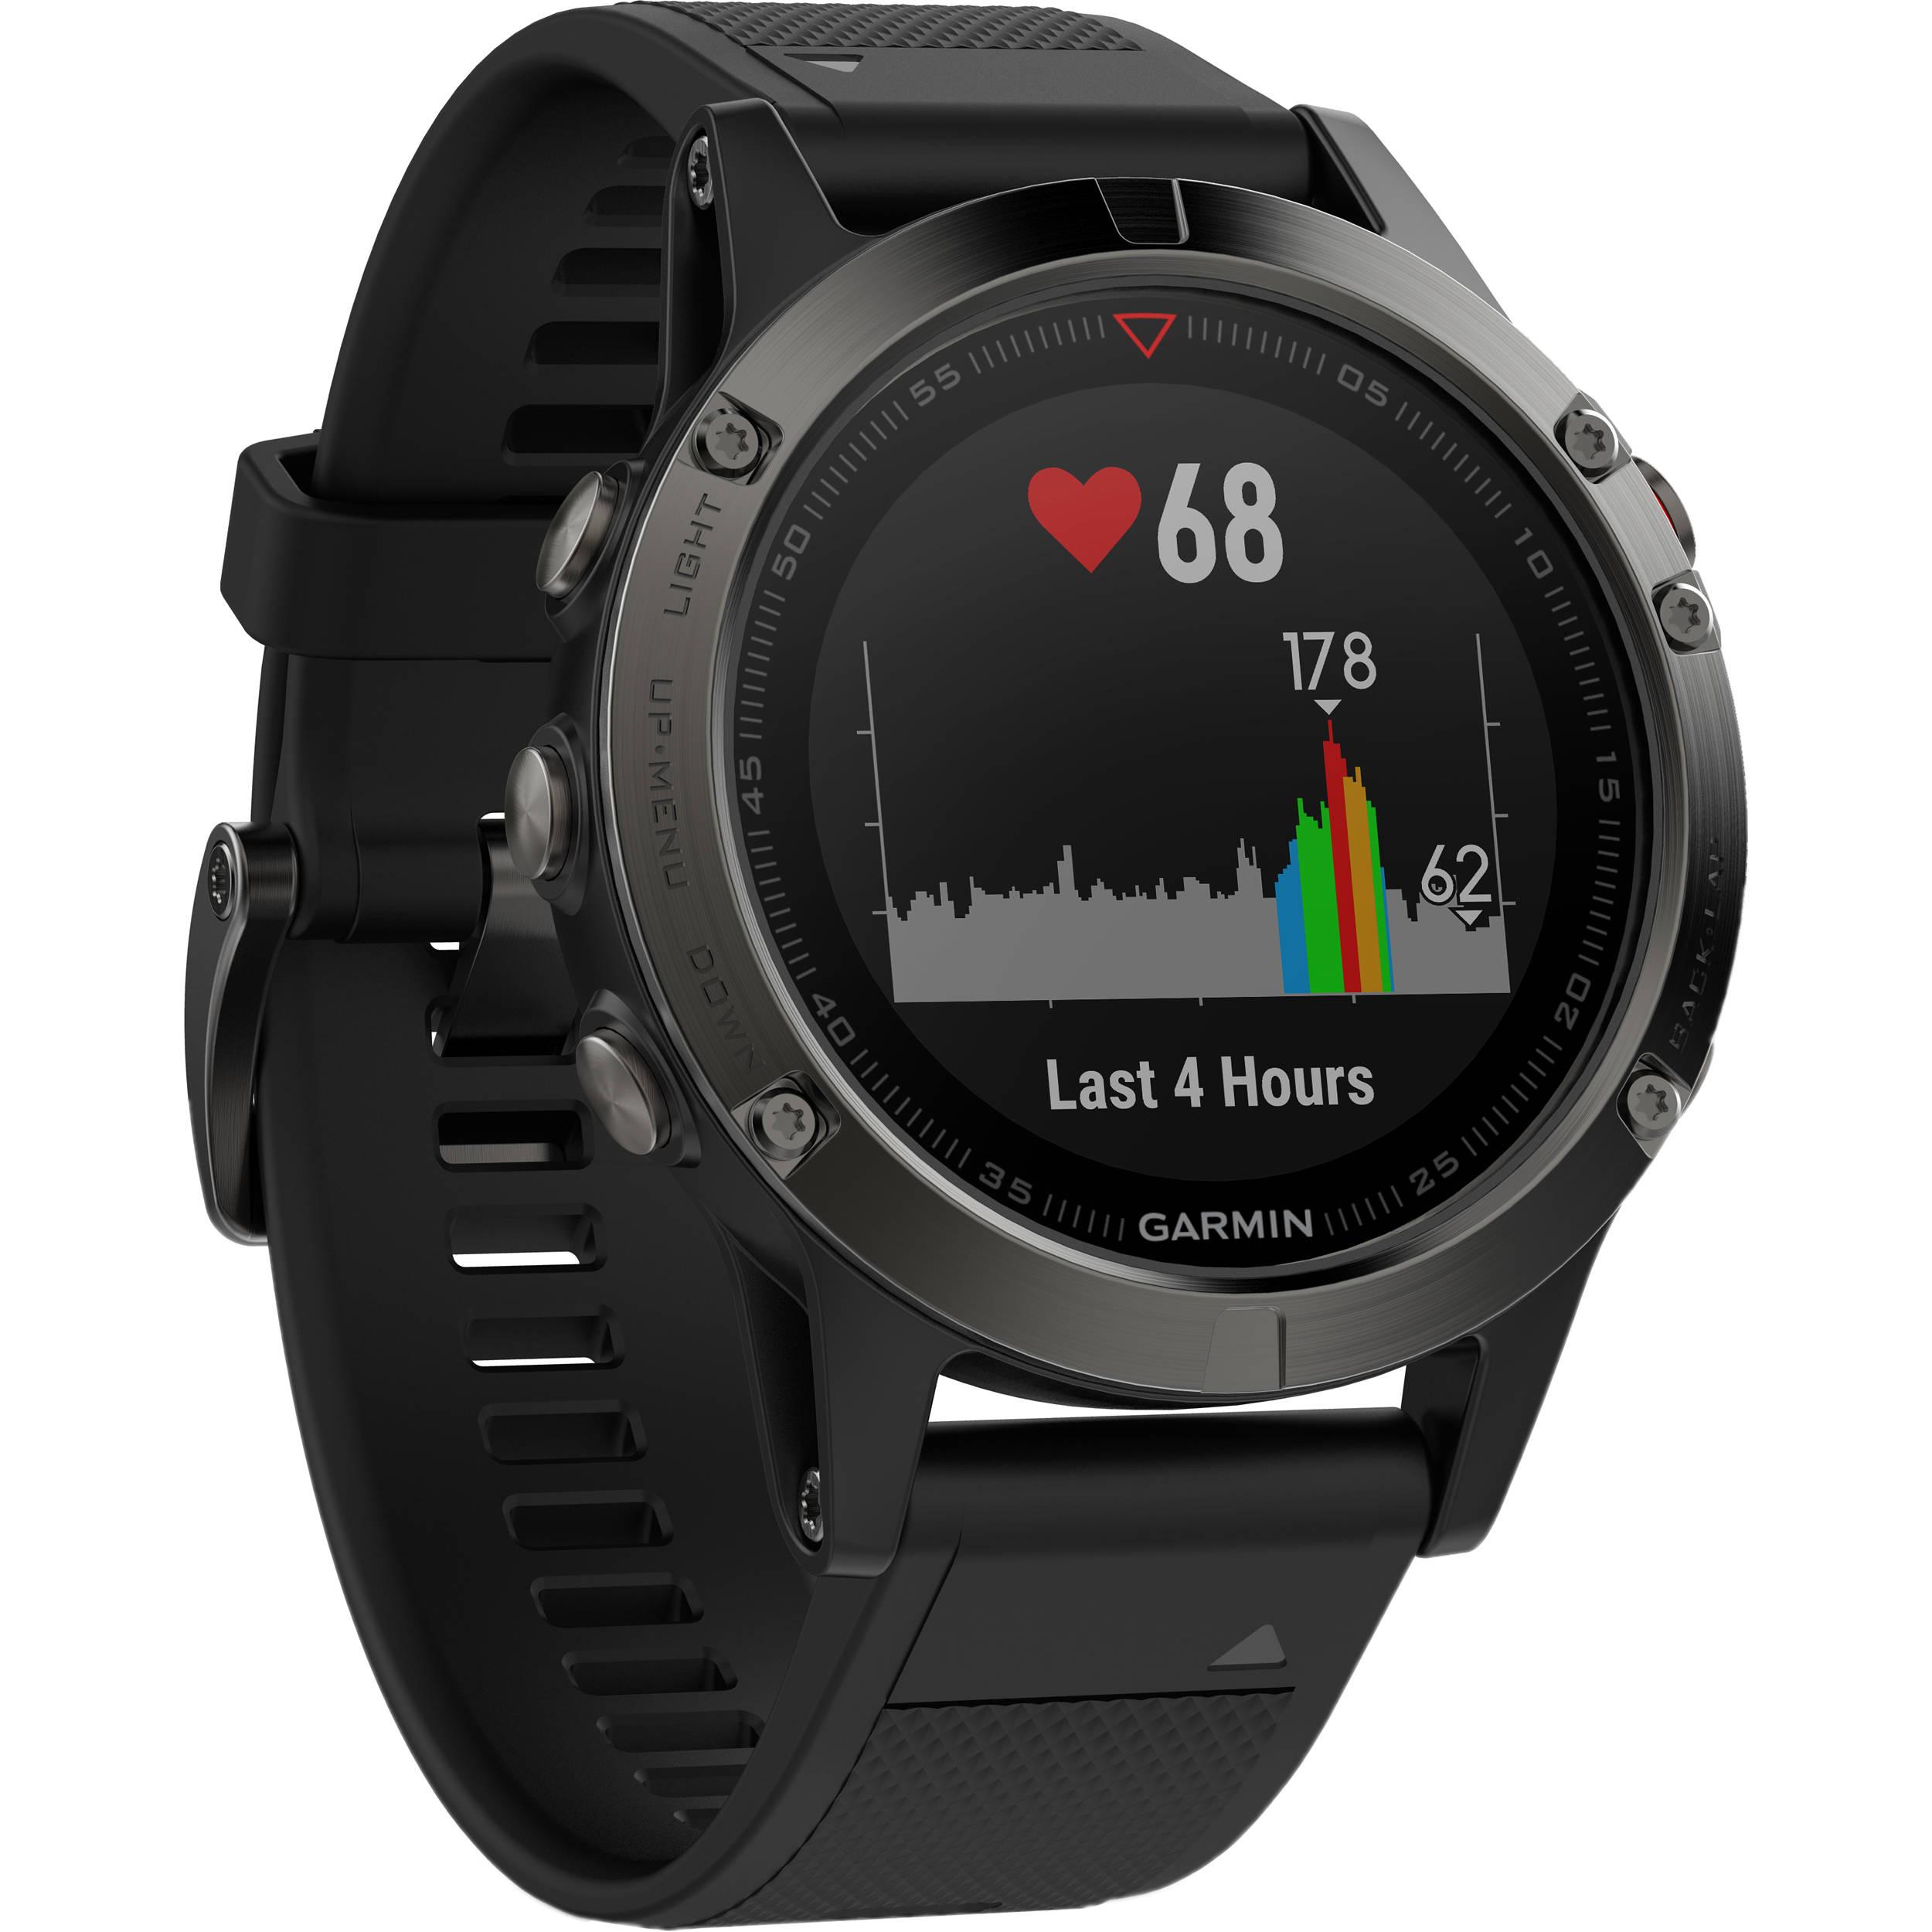 Sports Training Watches Bh Photo Video 84 S10 Fuse Box Garmin Fenix 5 Sapphire Edition Multi Sport Gps Watch Black Band